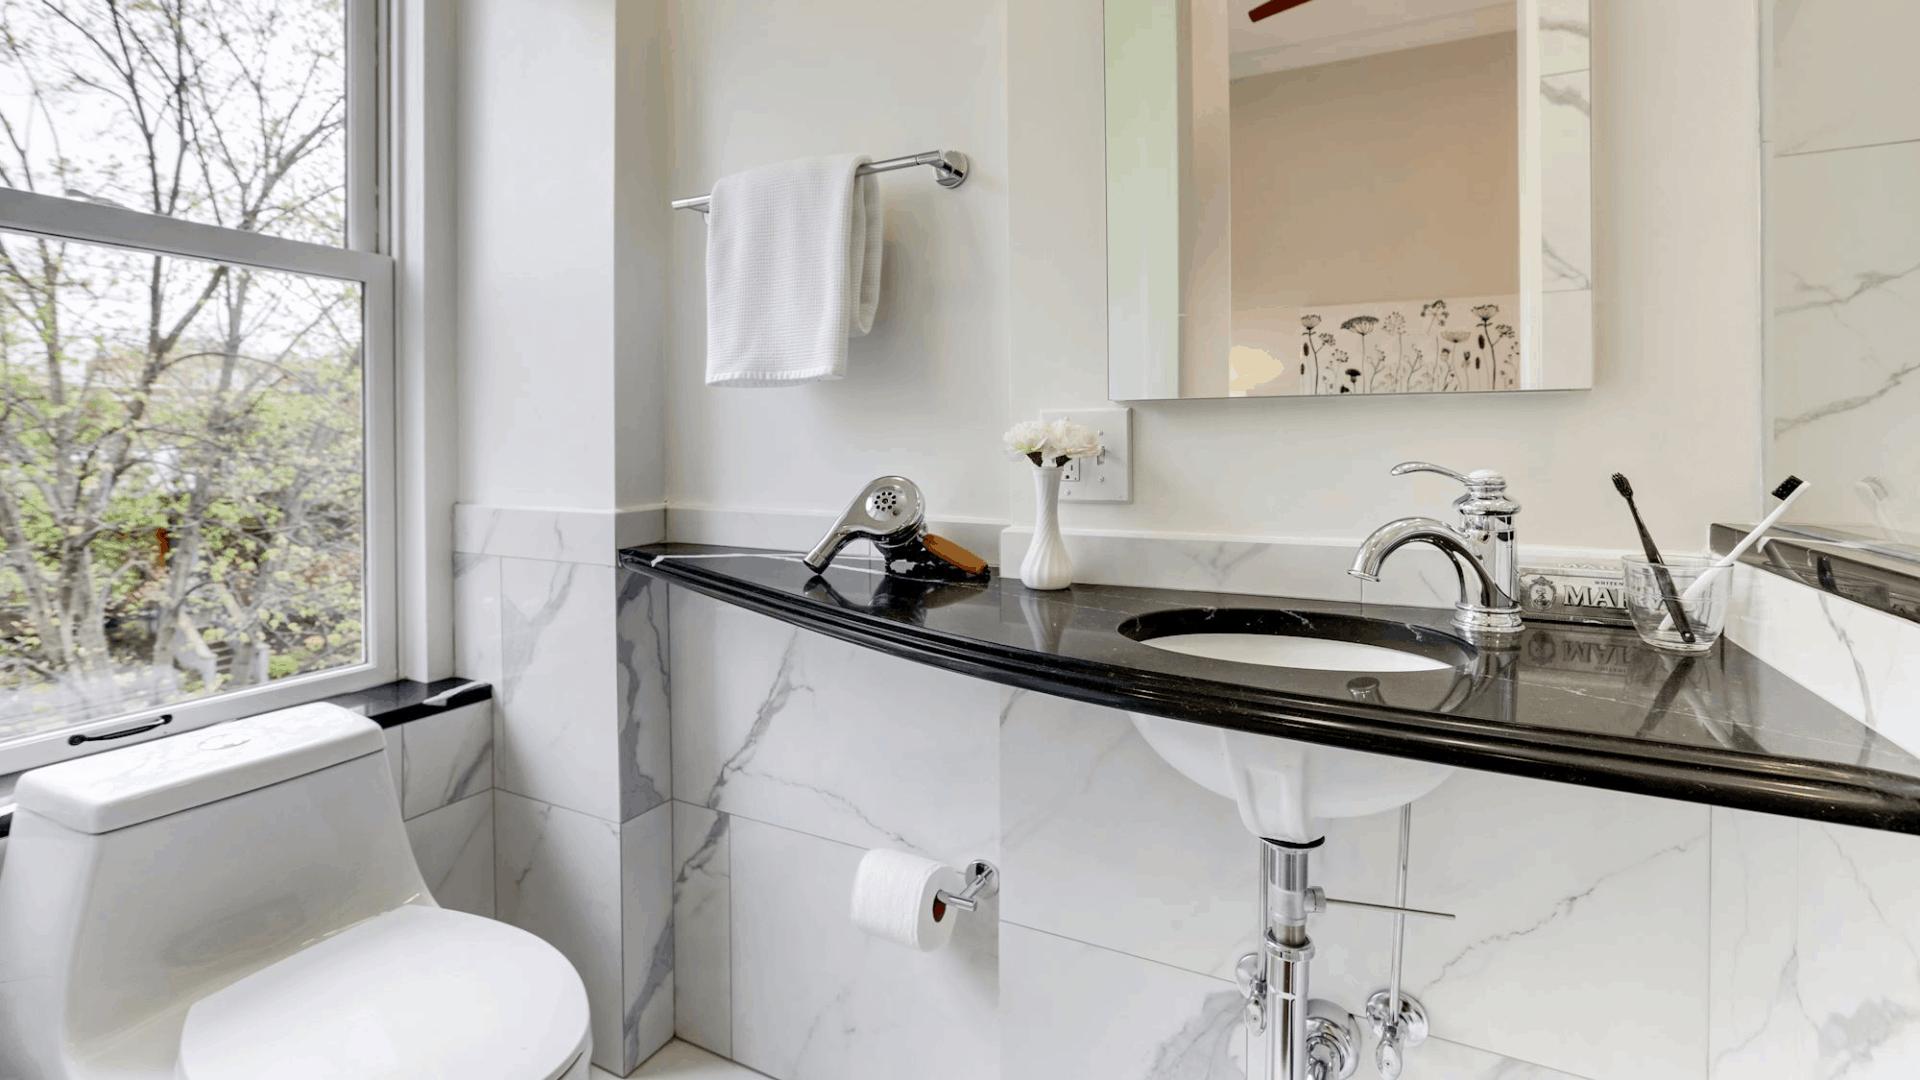 A_SE#2_bath_sink_counter_1920x1080